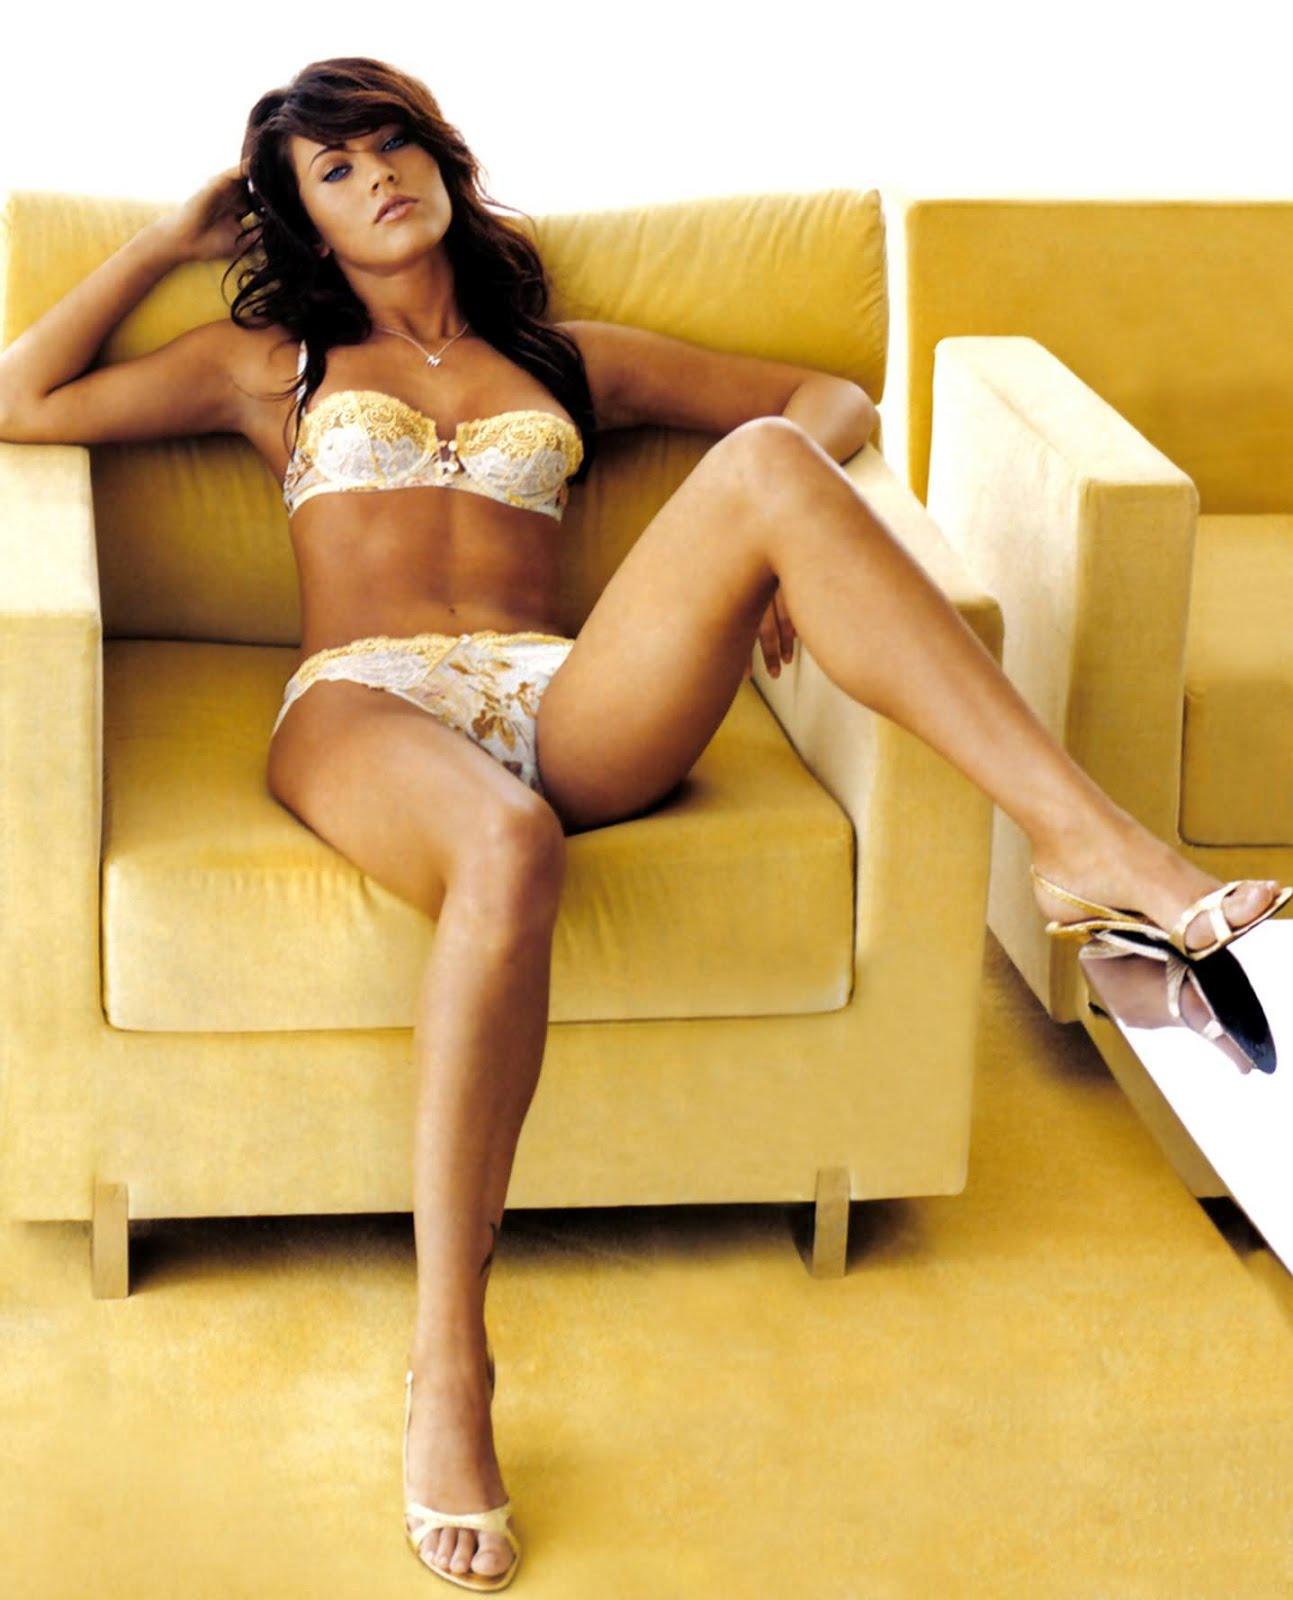 megan fox at sofa nude sex ready Megan%2BFox%2Bhot%2BBody youtube movies sexy hot nude xxx sex video indian girls: Megan Fox hot Body ...